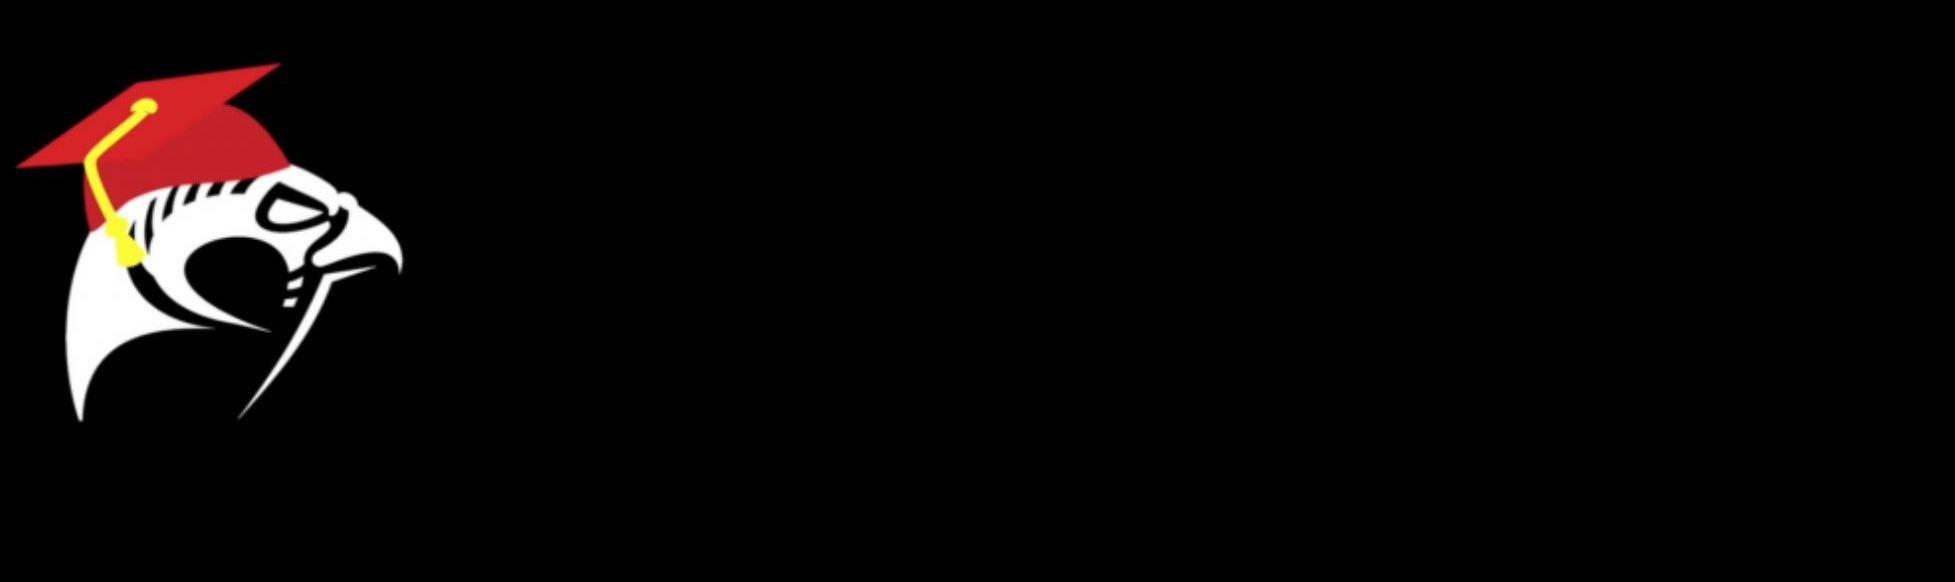 horosAca.jpg